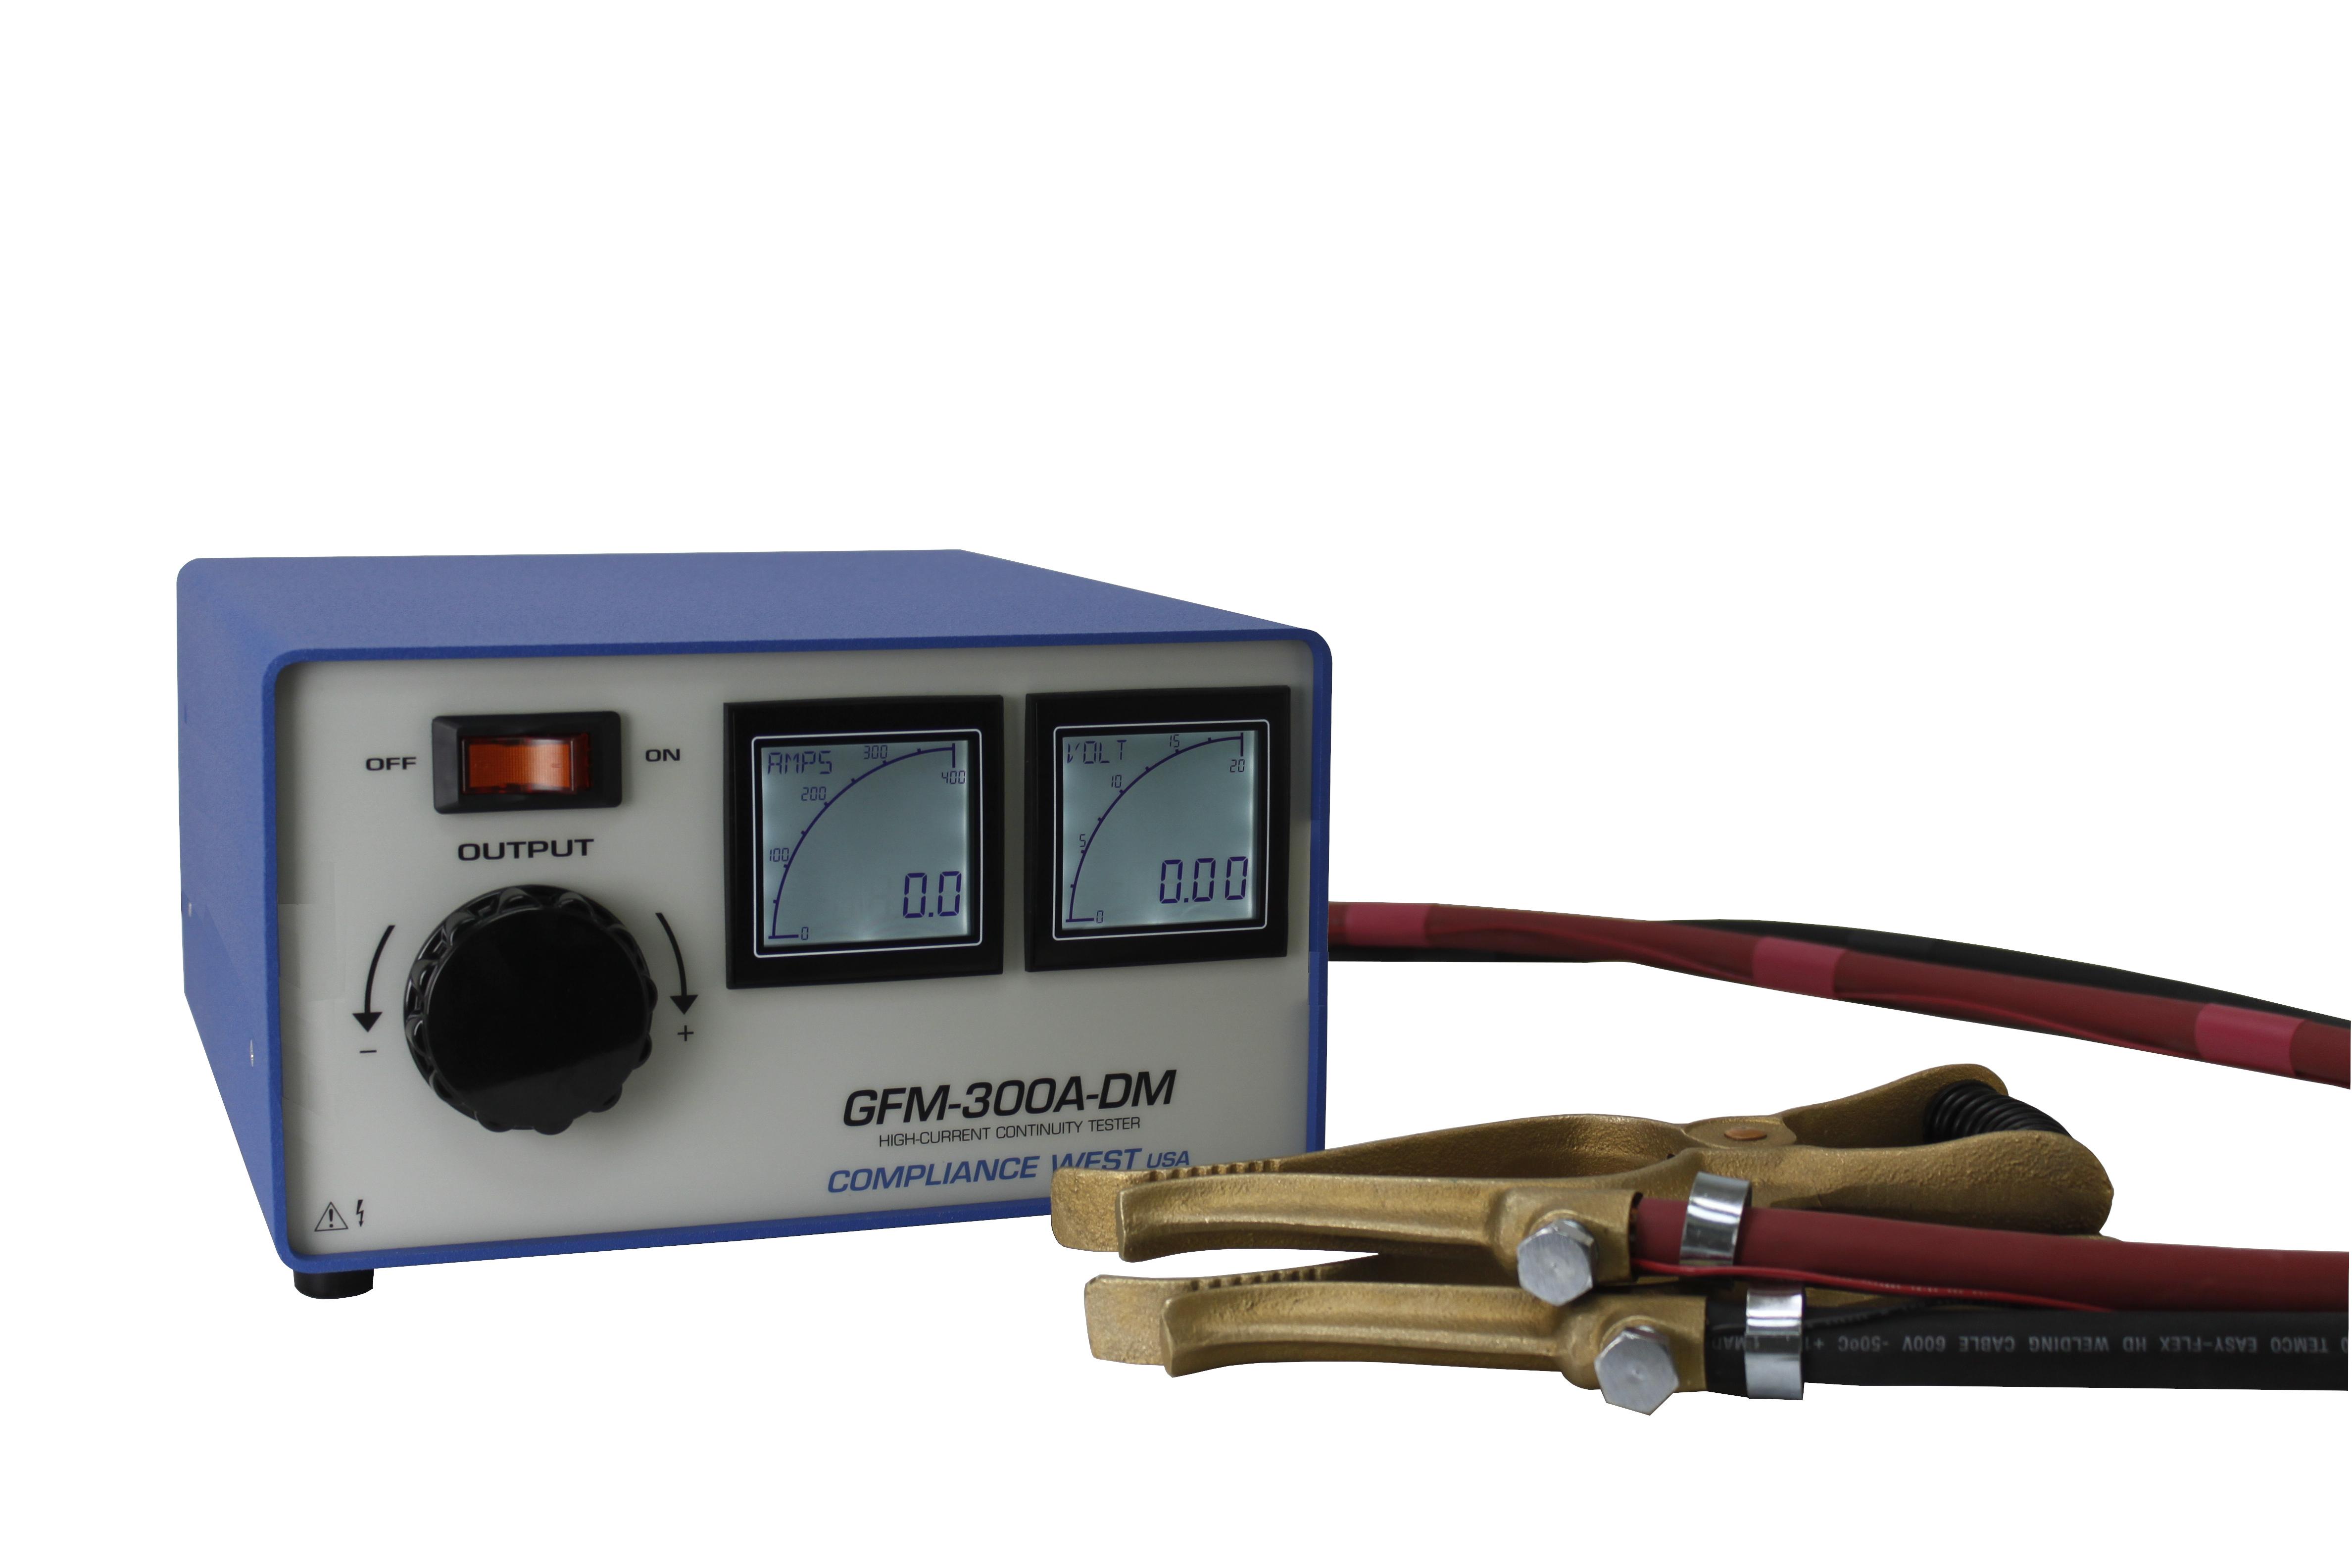 Compliance West GFM-300A-DM Ground Continuity Tester